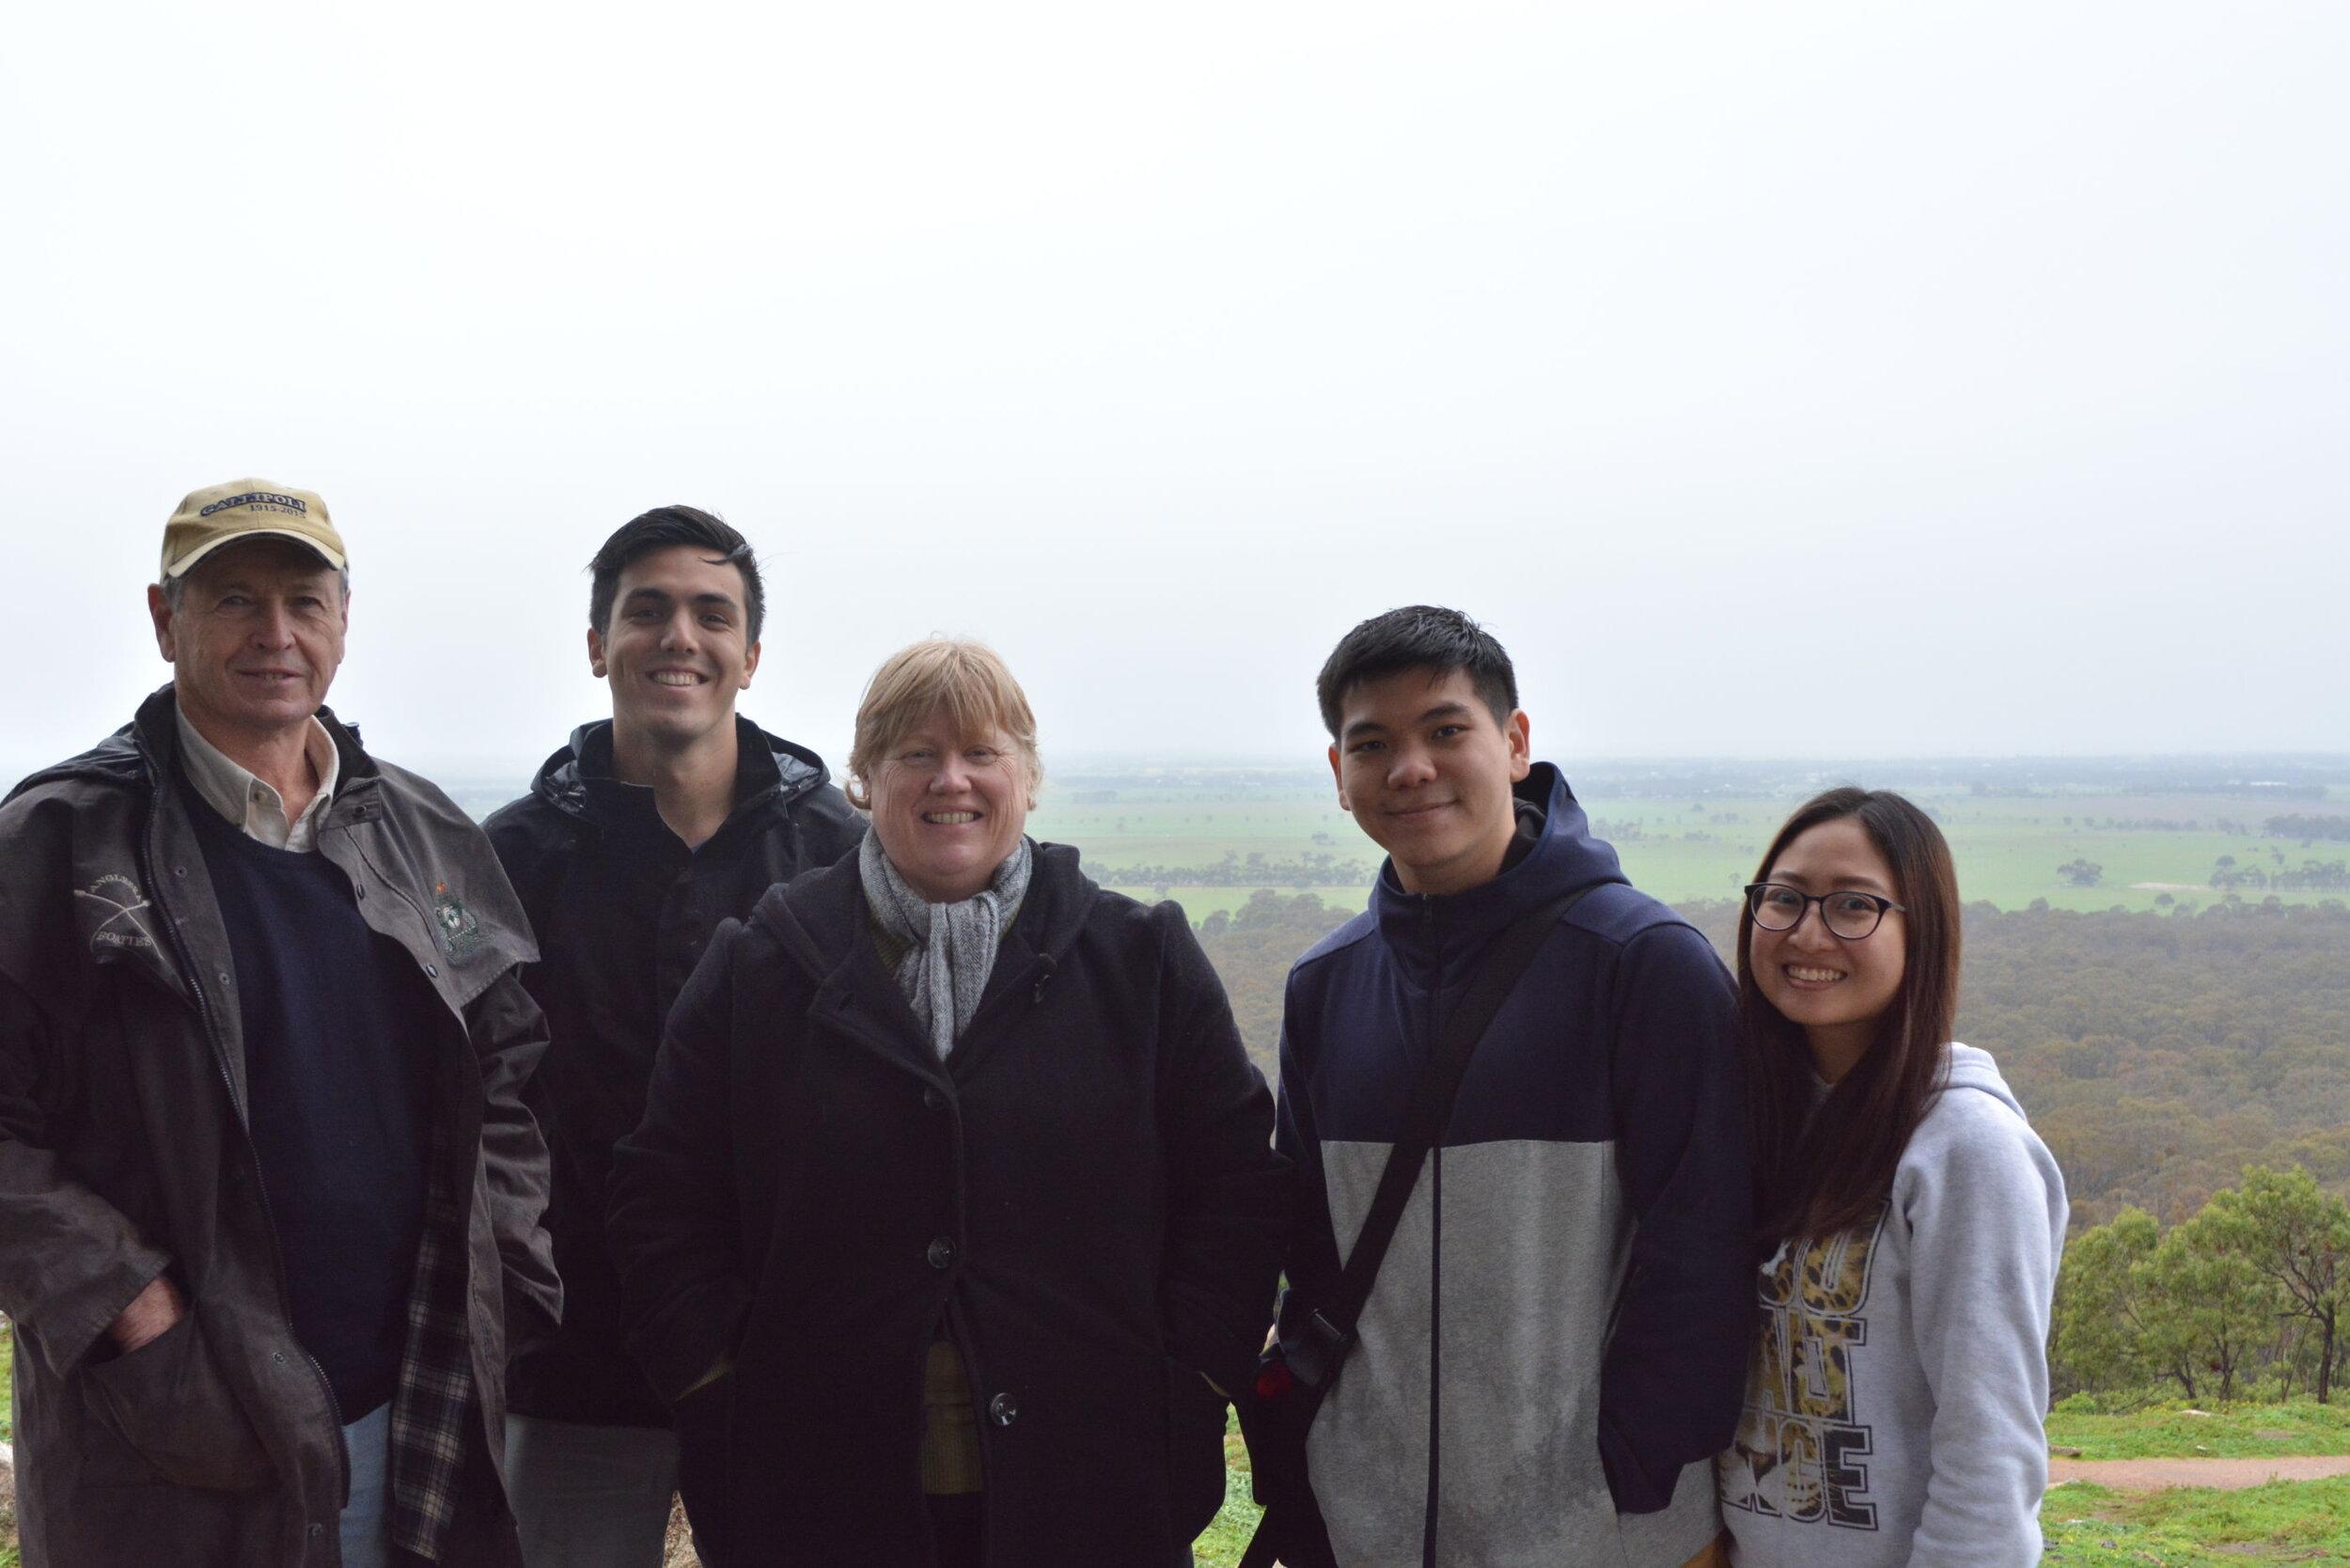 L-R | Barry White, Nicholas Soraghan (reporter), Sally Nicholas, Joshua Tay Hanwen (reporter), Wan Li Loh (reporter)